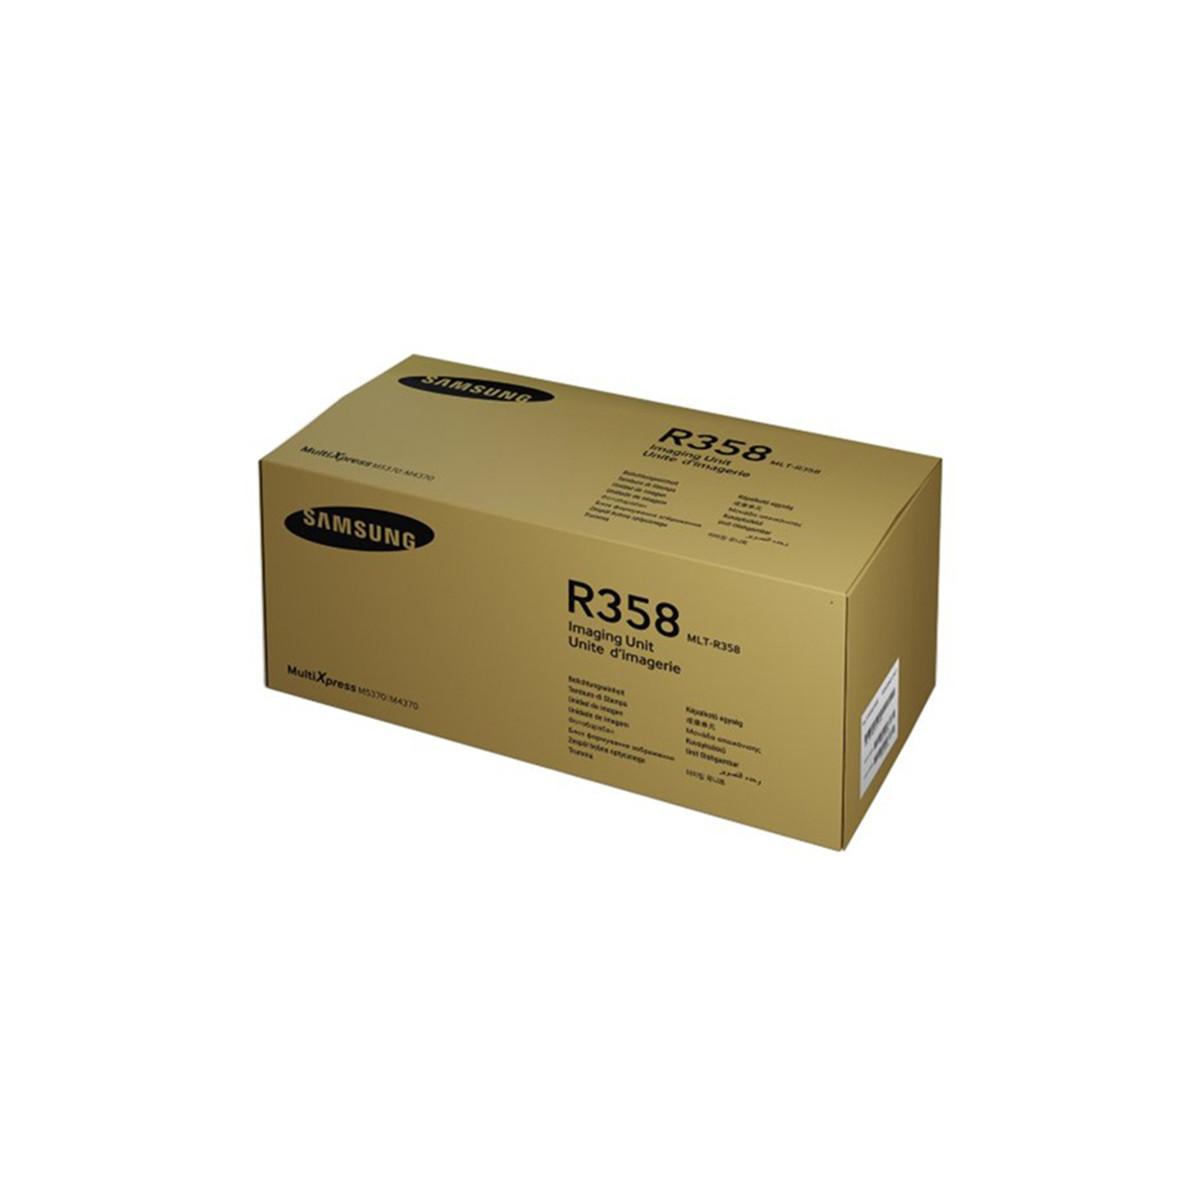 Cartucho de Cilindro Samsung MLT-R358 | M5370LX M4370LX M5360RX M5370 M4370 | Original 100k